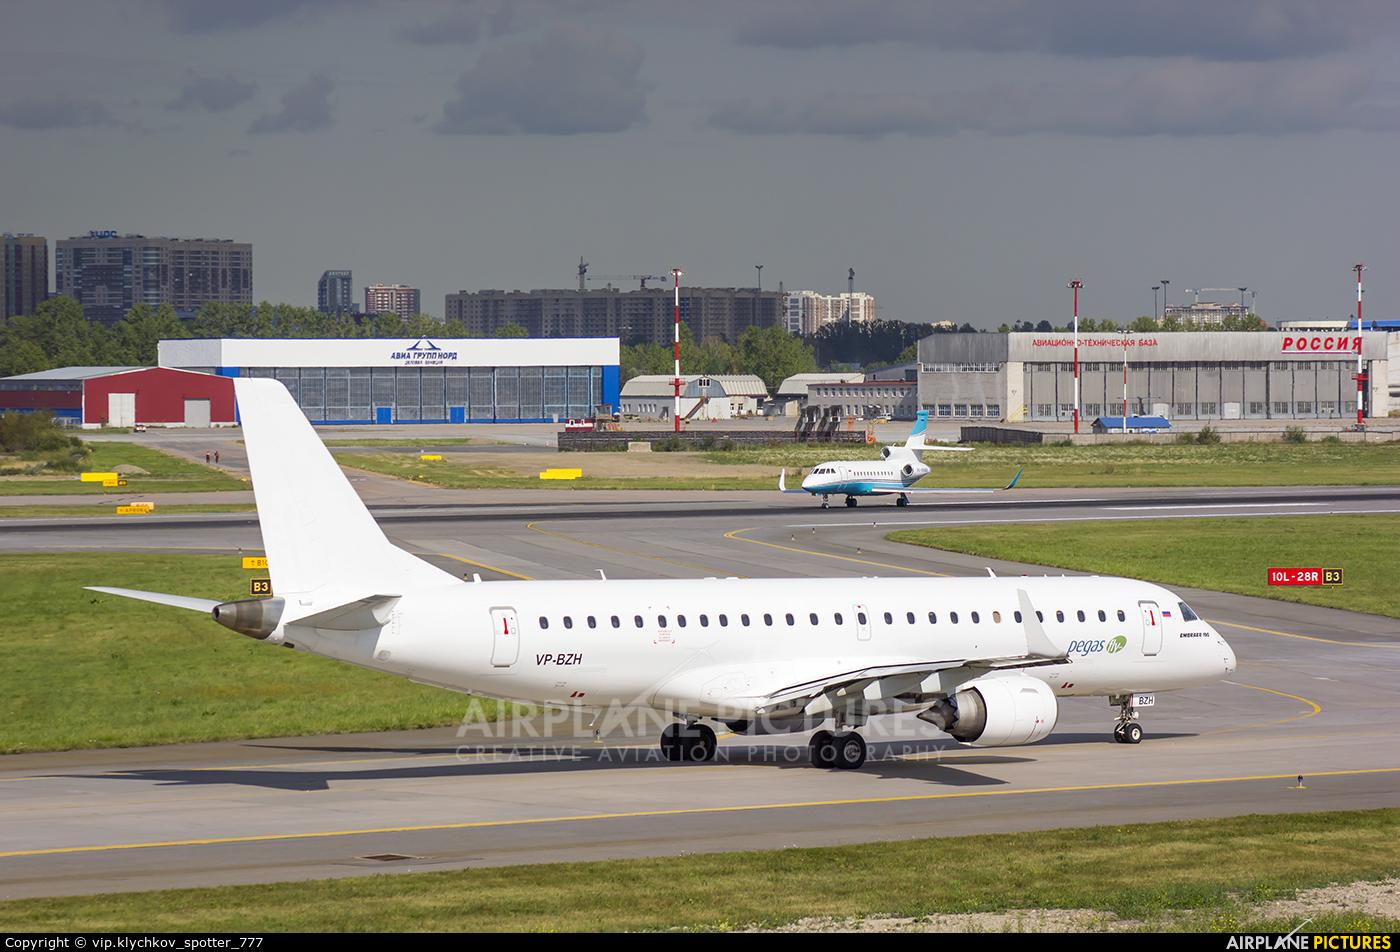 Ikar Airlines VP-BZH aircraft at St. Petersburg - Pulkovo